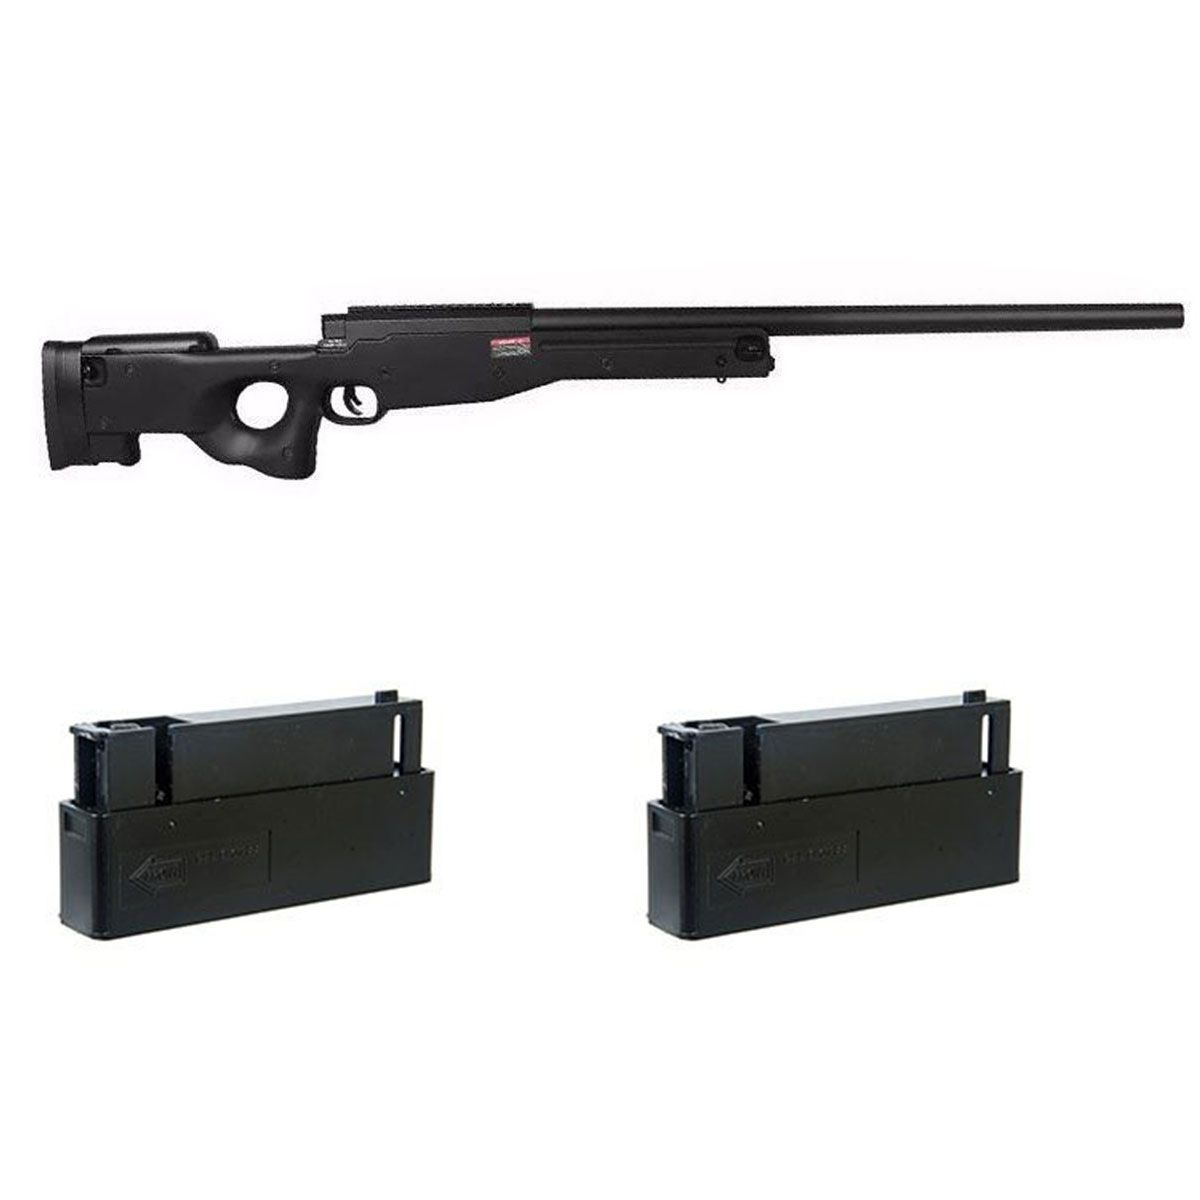 Kit Sniper Evo L96 Preto + 2 Magazine Extra